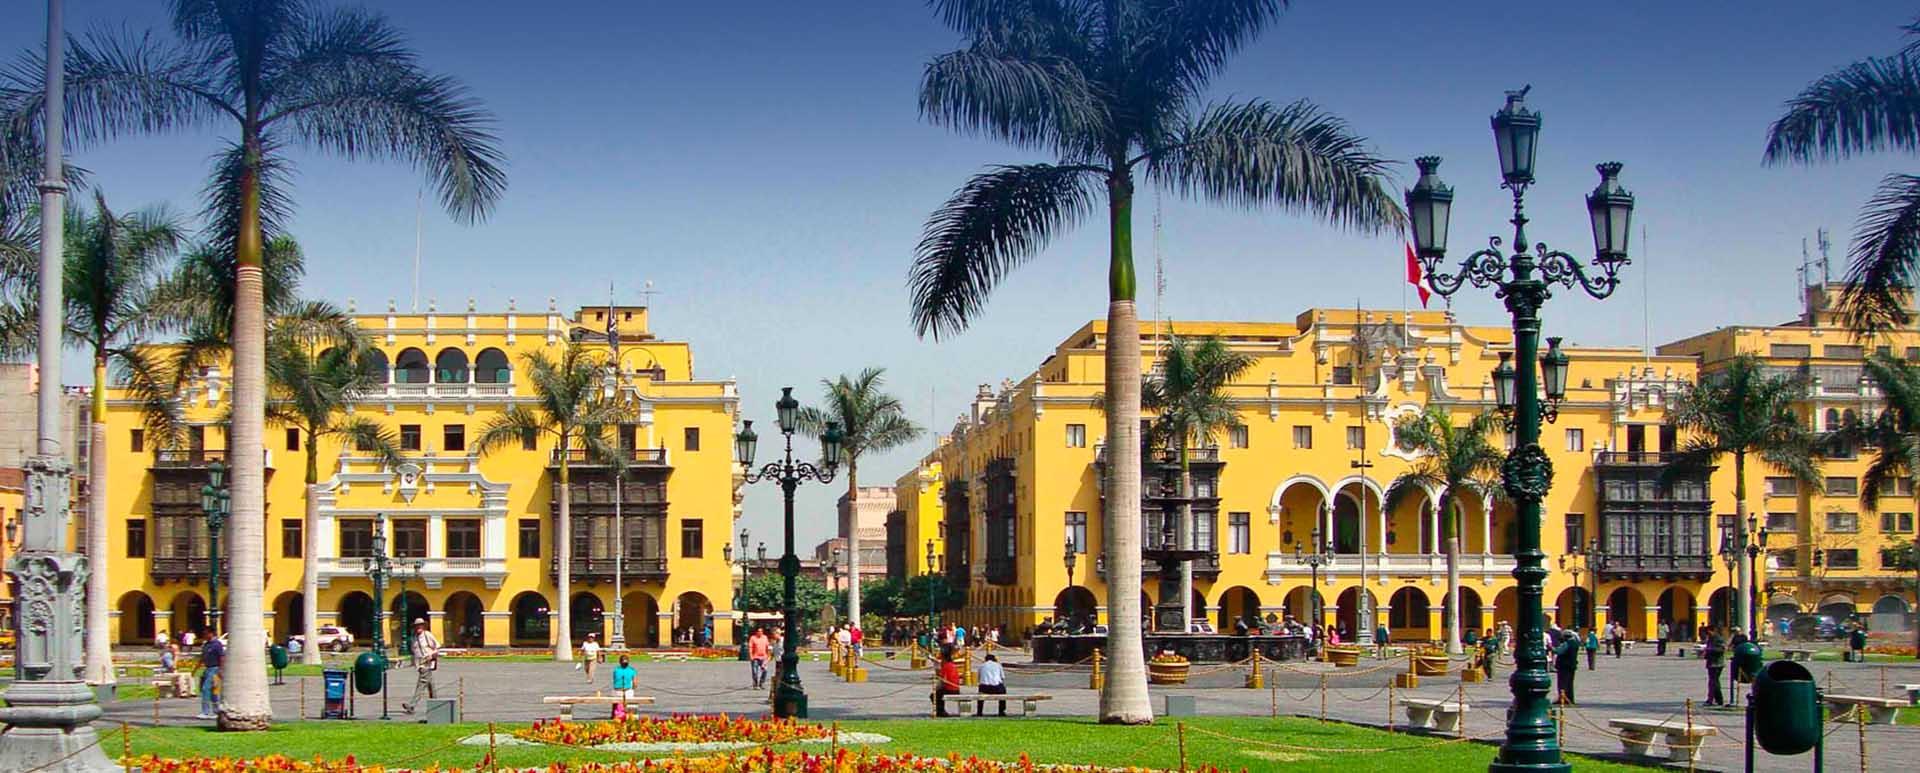 Lima Peru old town